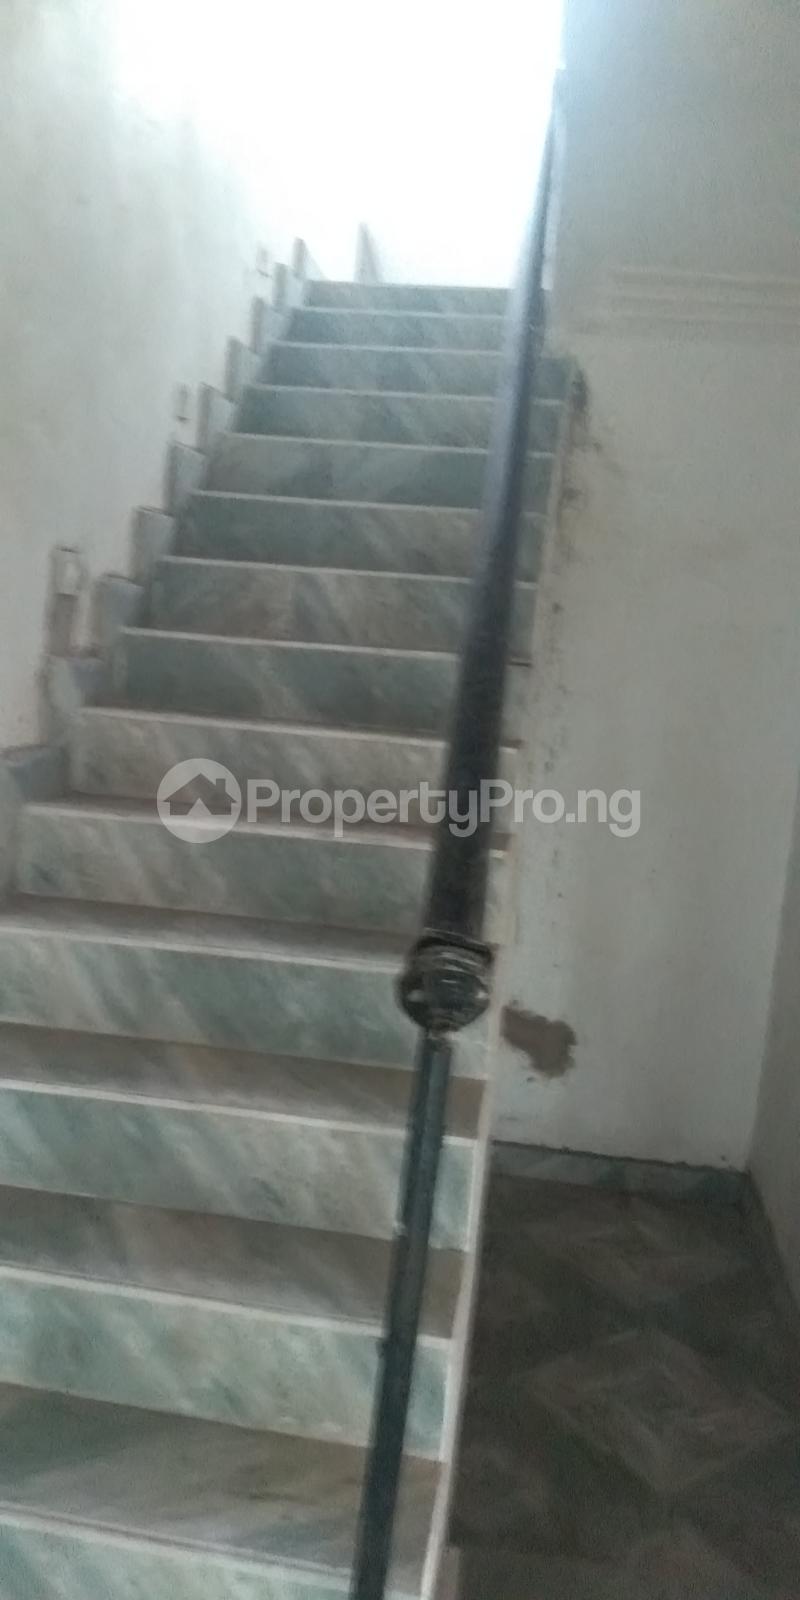 5 bedroom Land for sale Bashiru shittu street magodo shangisha Magodo GRA Phase 2 Kosofe/Ikosi Lagos - 10